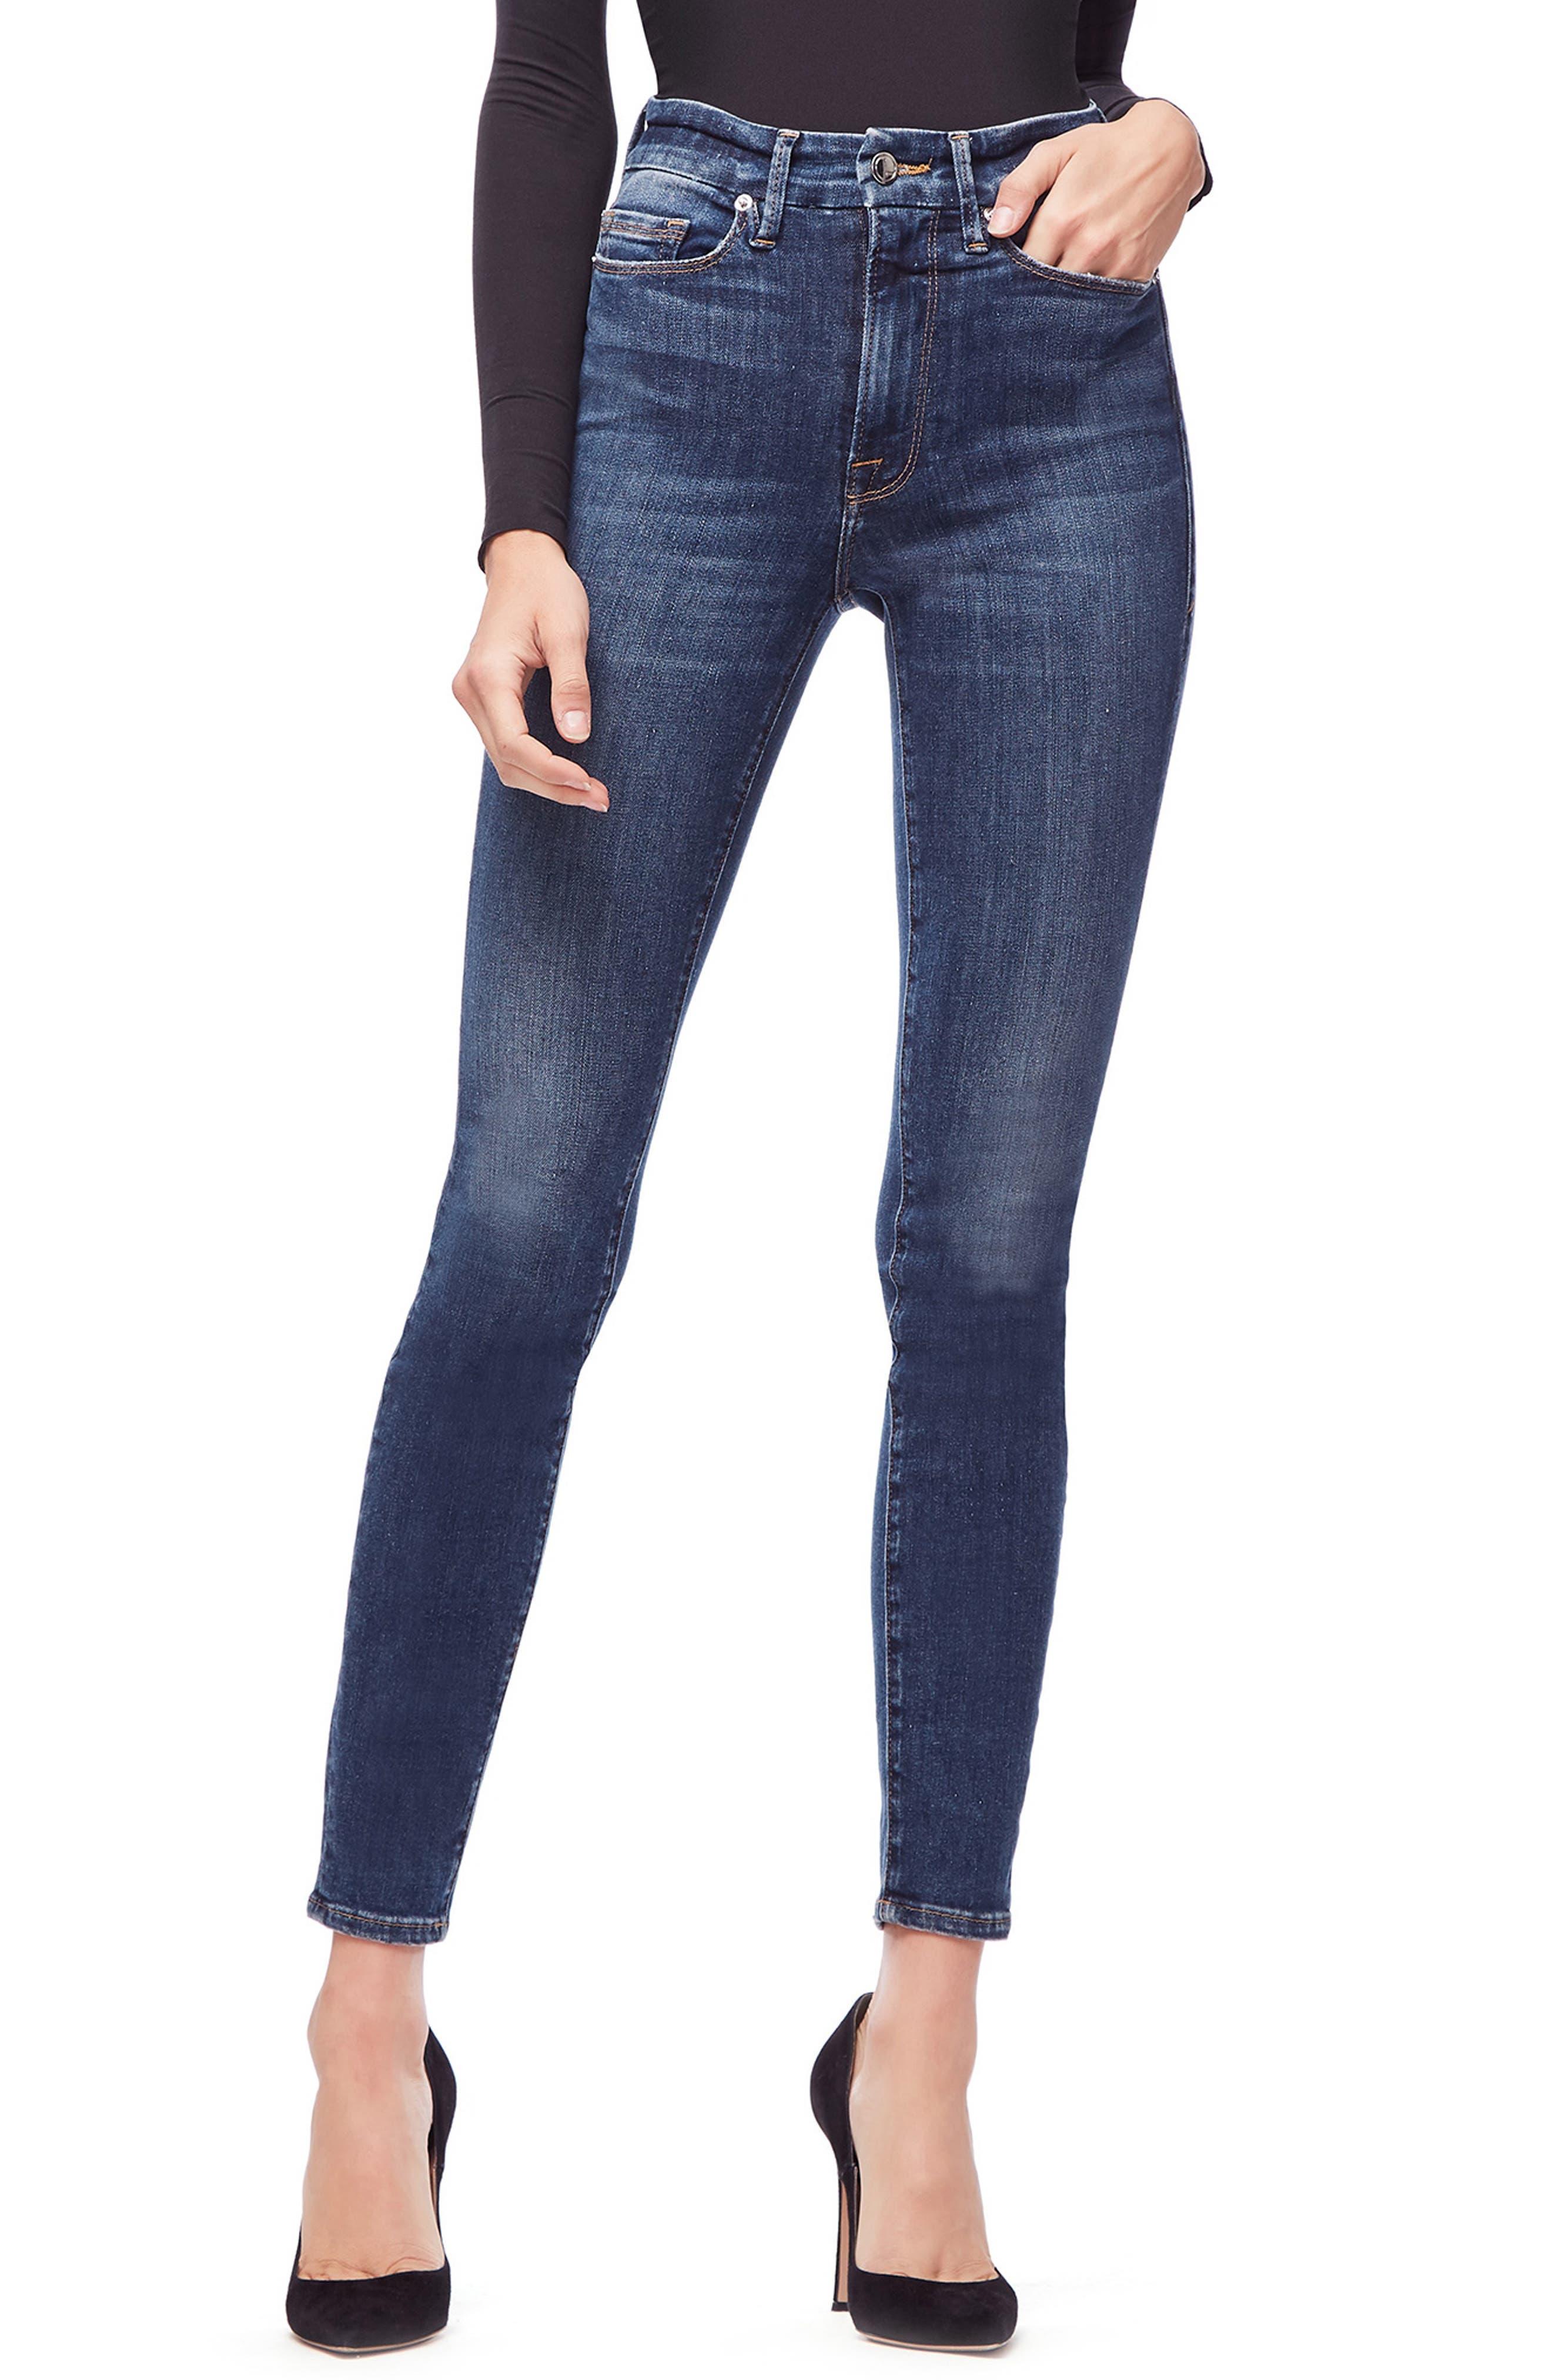 GOOD AMERICAN, Good Waist Ripped High Waist Skinny Jeans, Main thumbnail 1, color, BLUE 195